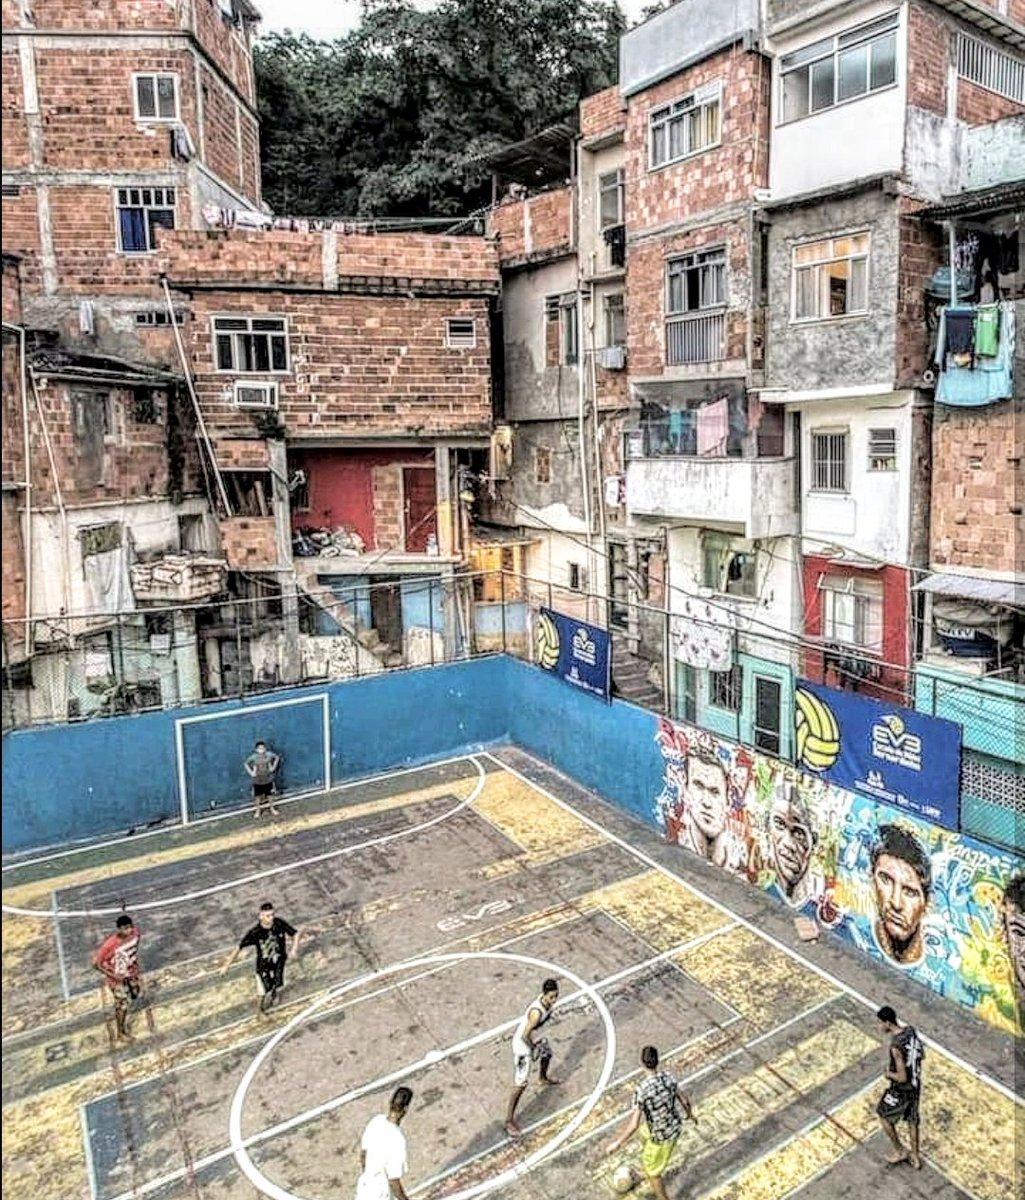 Favela Football Pitch #riodejaneiro #brazil pic.twitter.com/a5JiKBlAvP